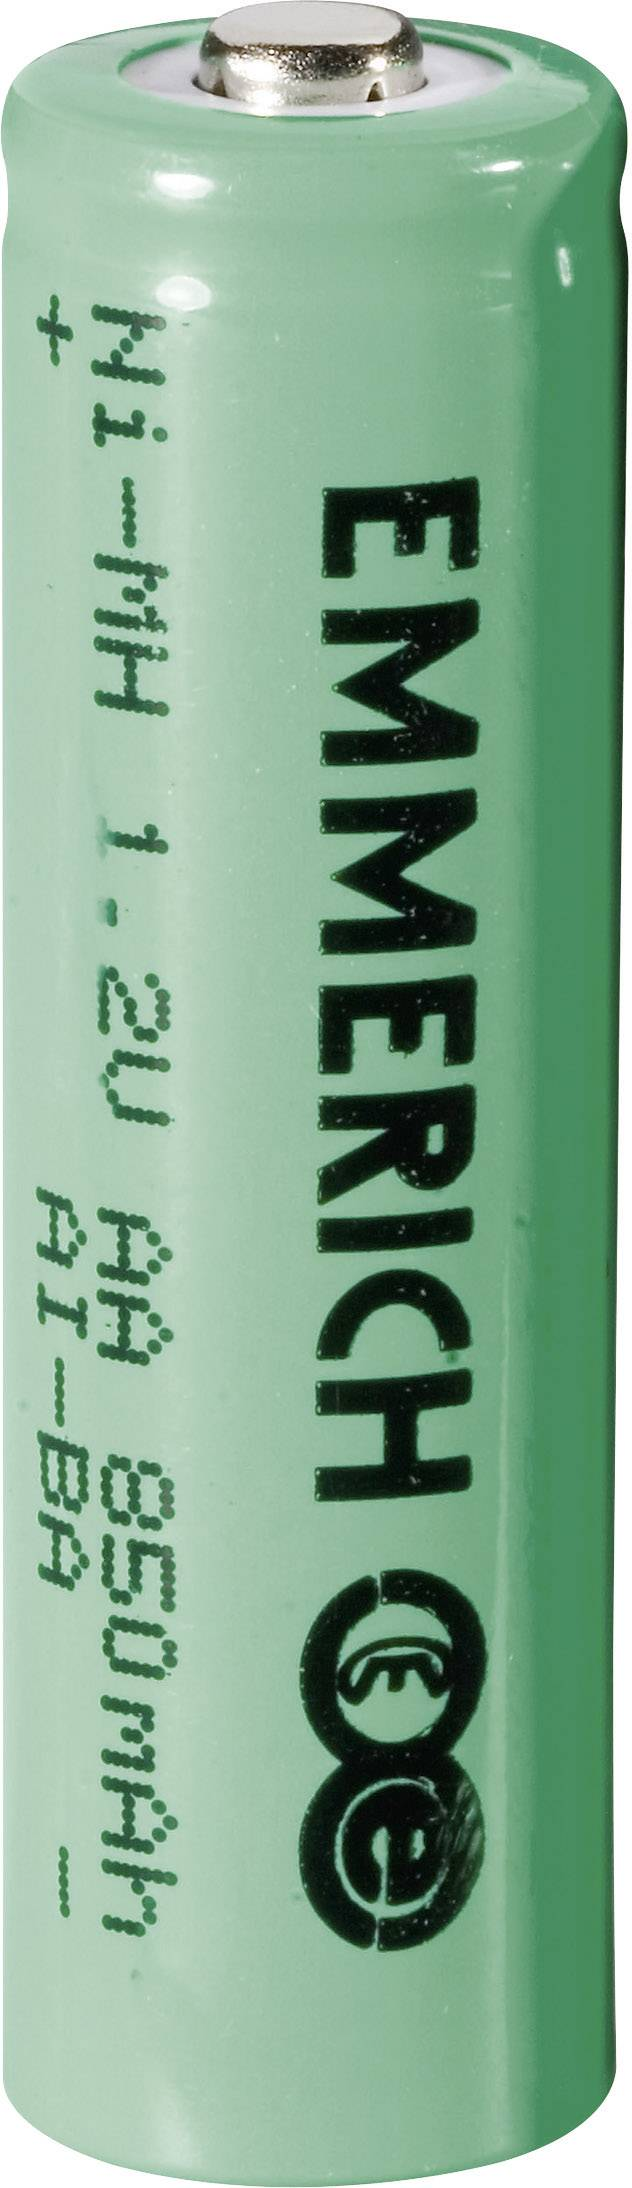 Tužkový akumulátor typu AA NiMH Emmerich HR06 255022, 850 mAh, 1.2 V, 1 ks